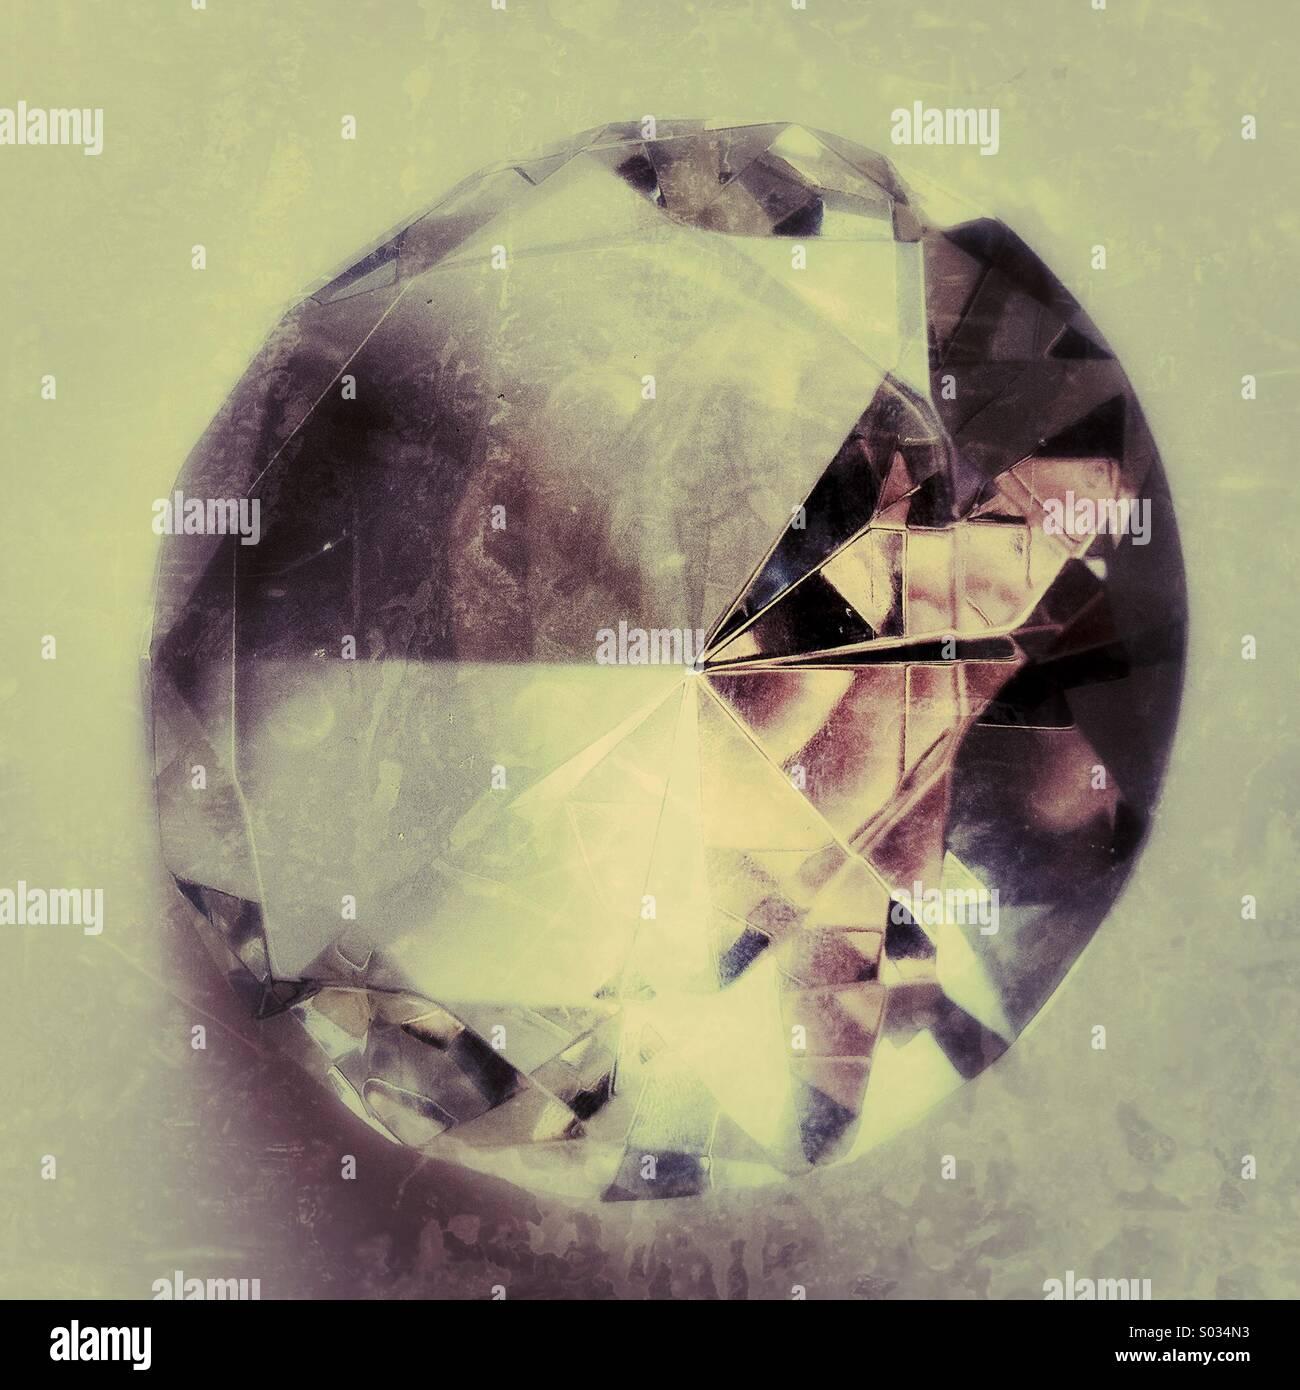 Diamond Imagen De Stock